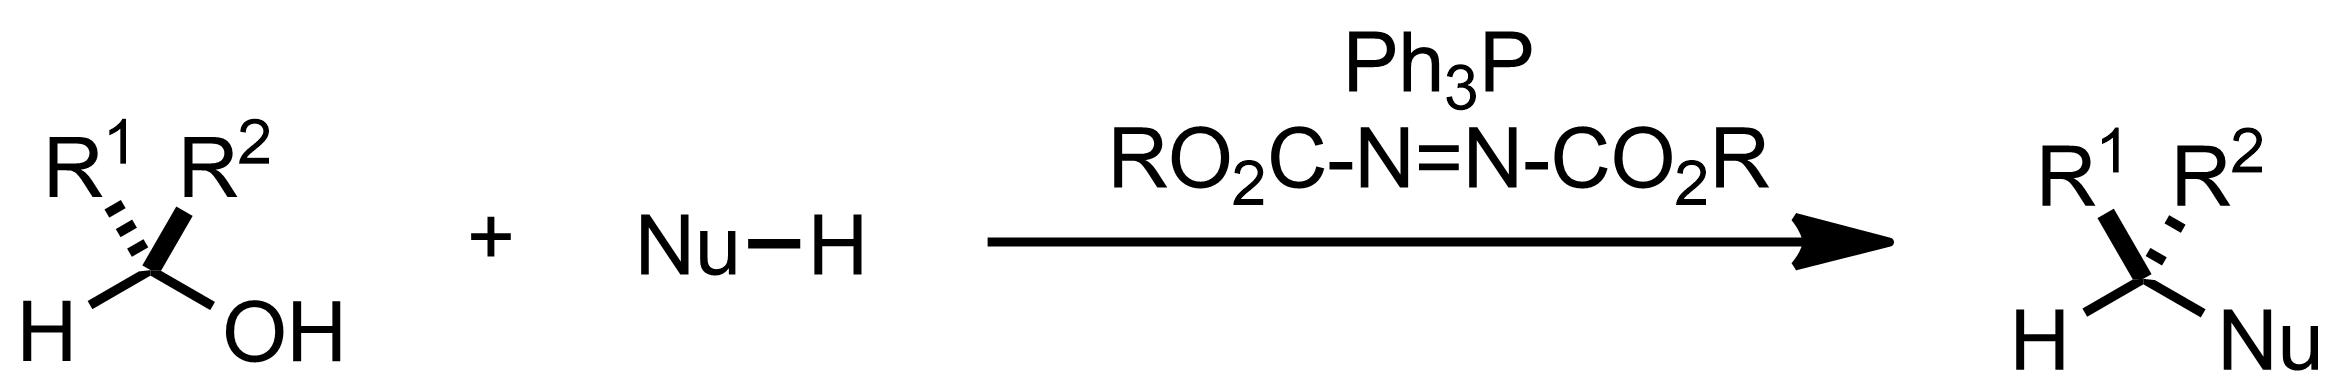 Schematic representation of the Mitsunobu Reaction.